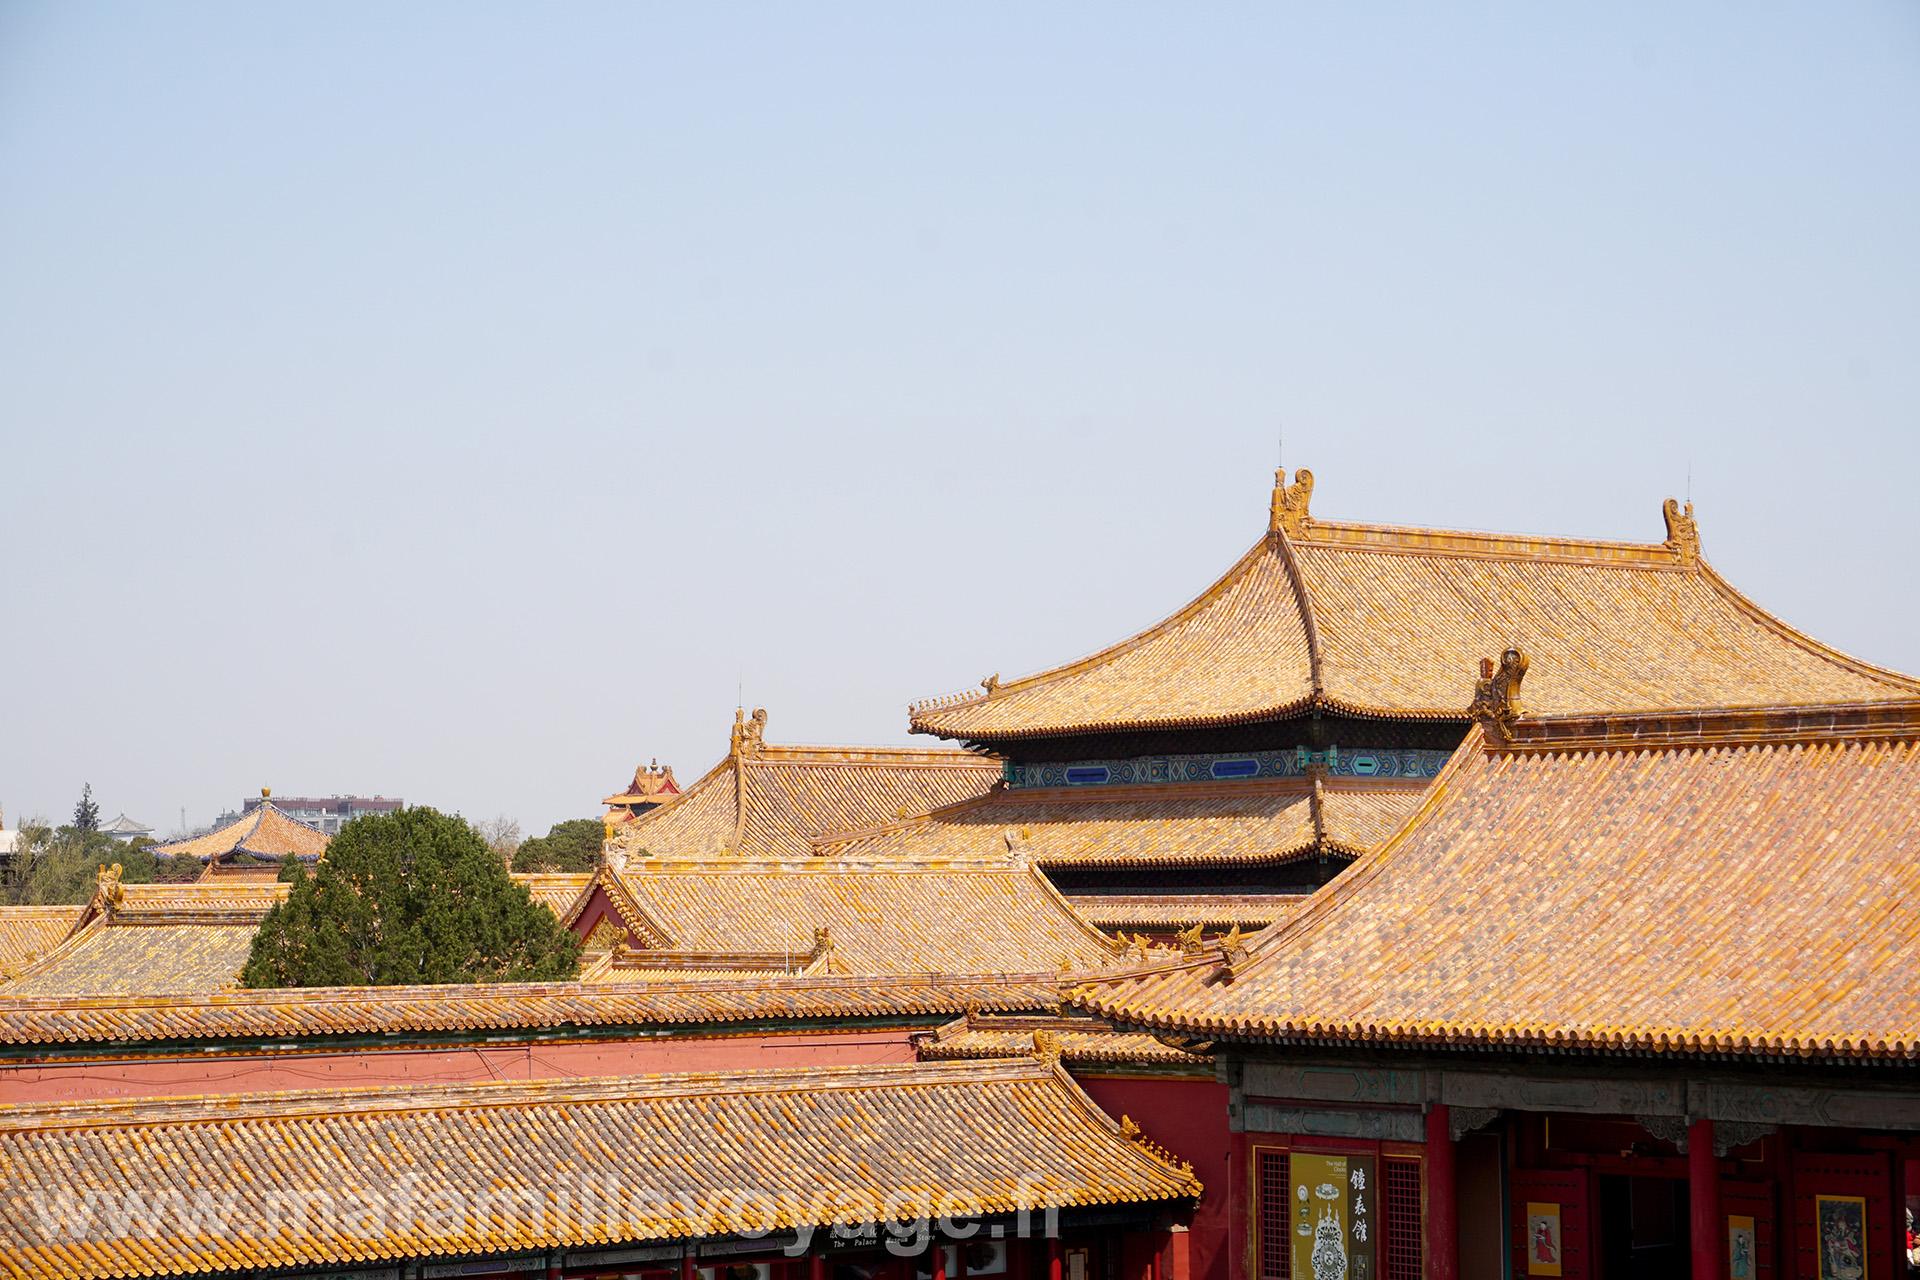 Magnifiques toits